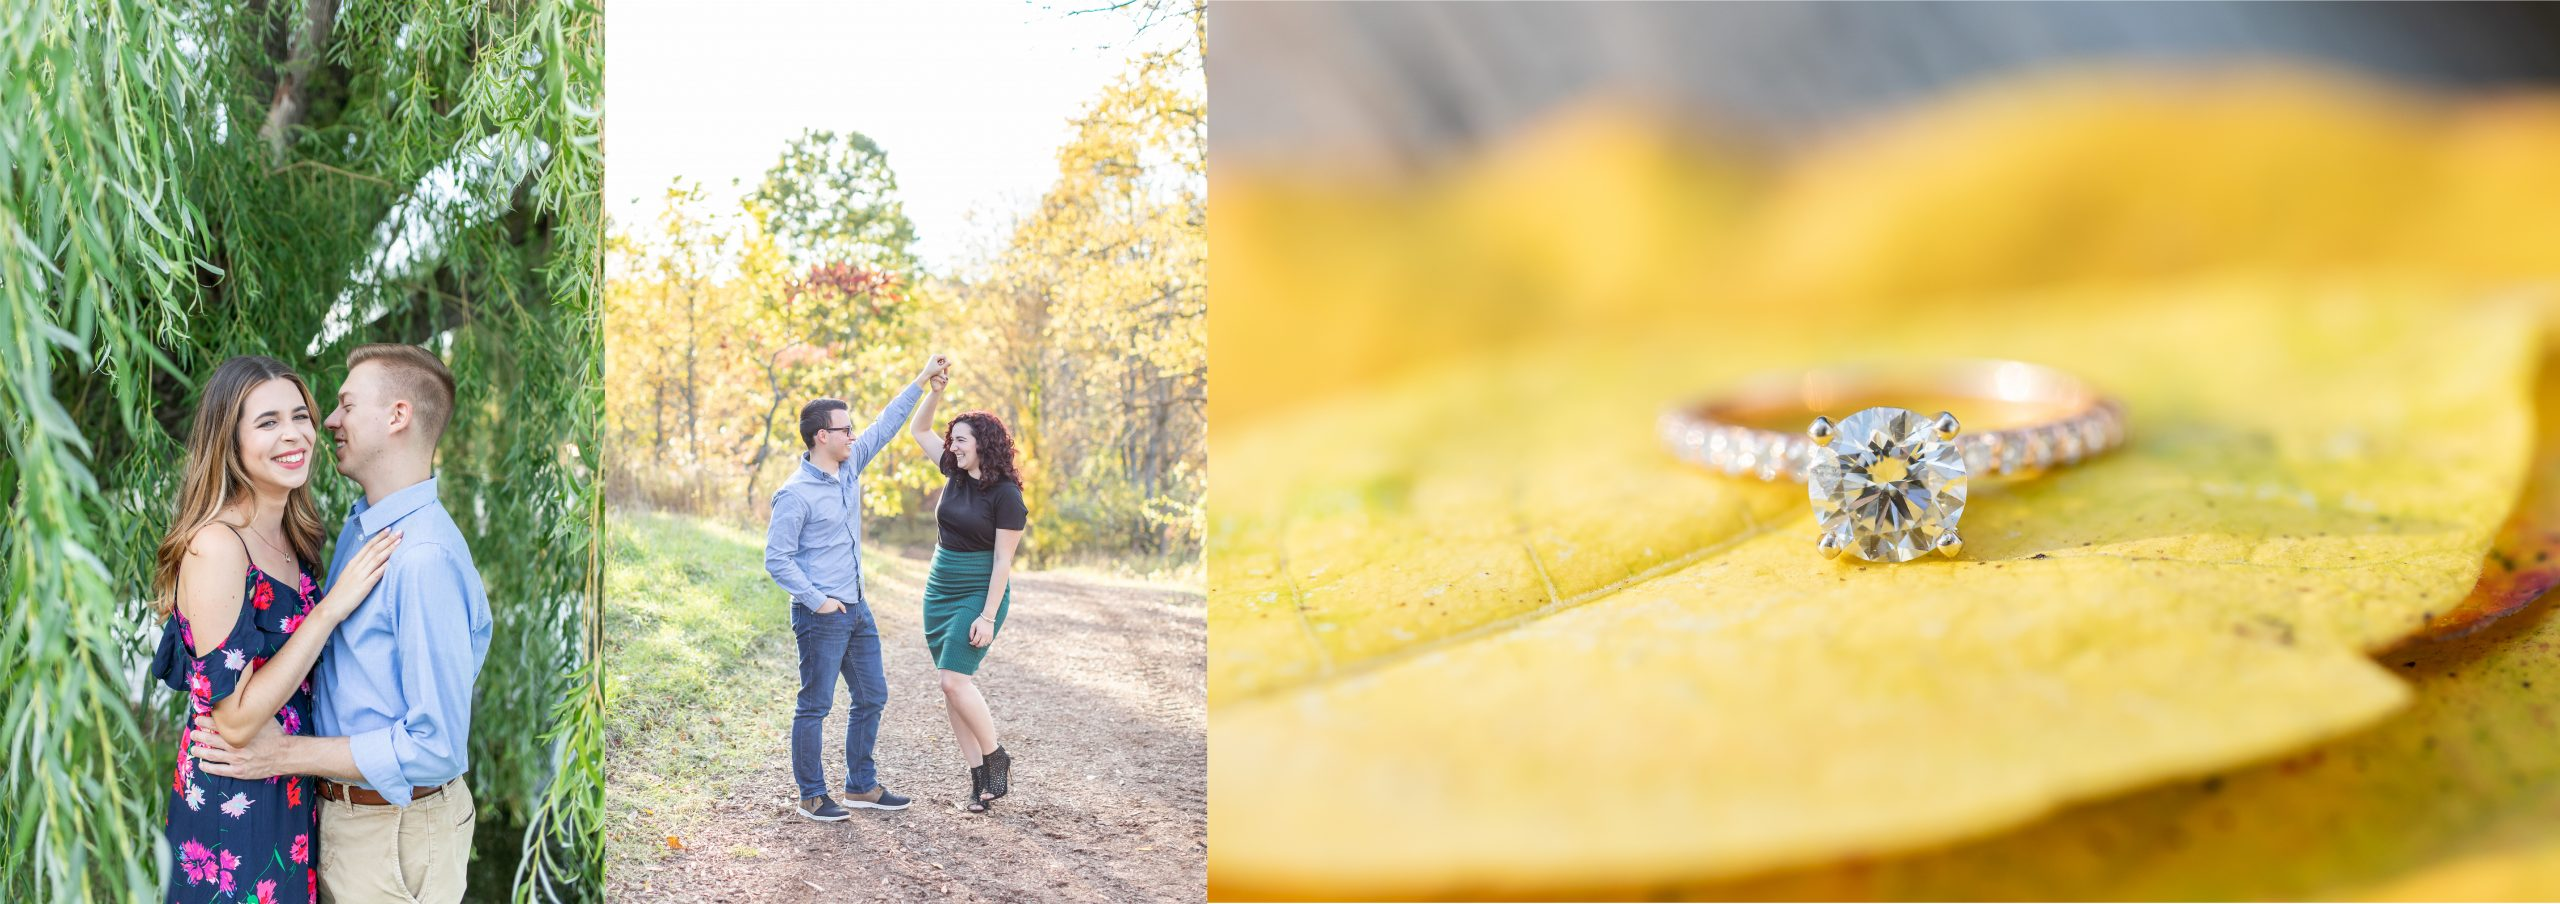 kandra-lynn-photography-wedding-photographer-15